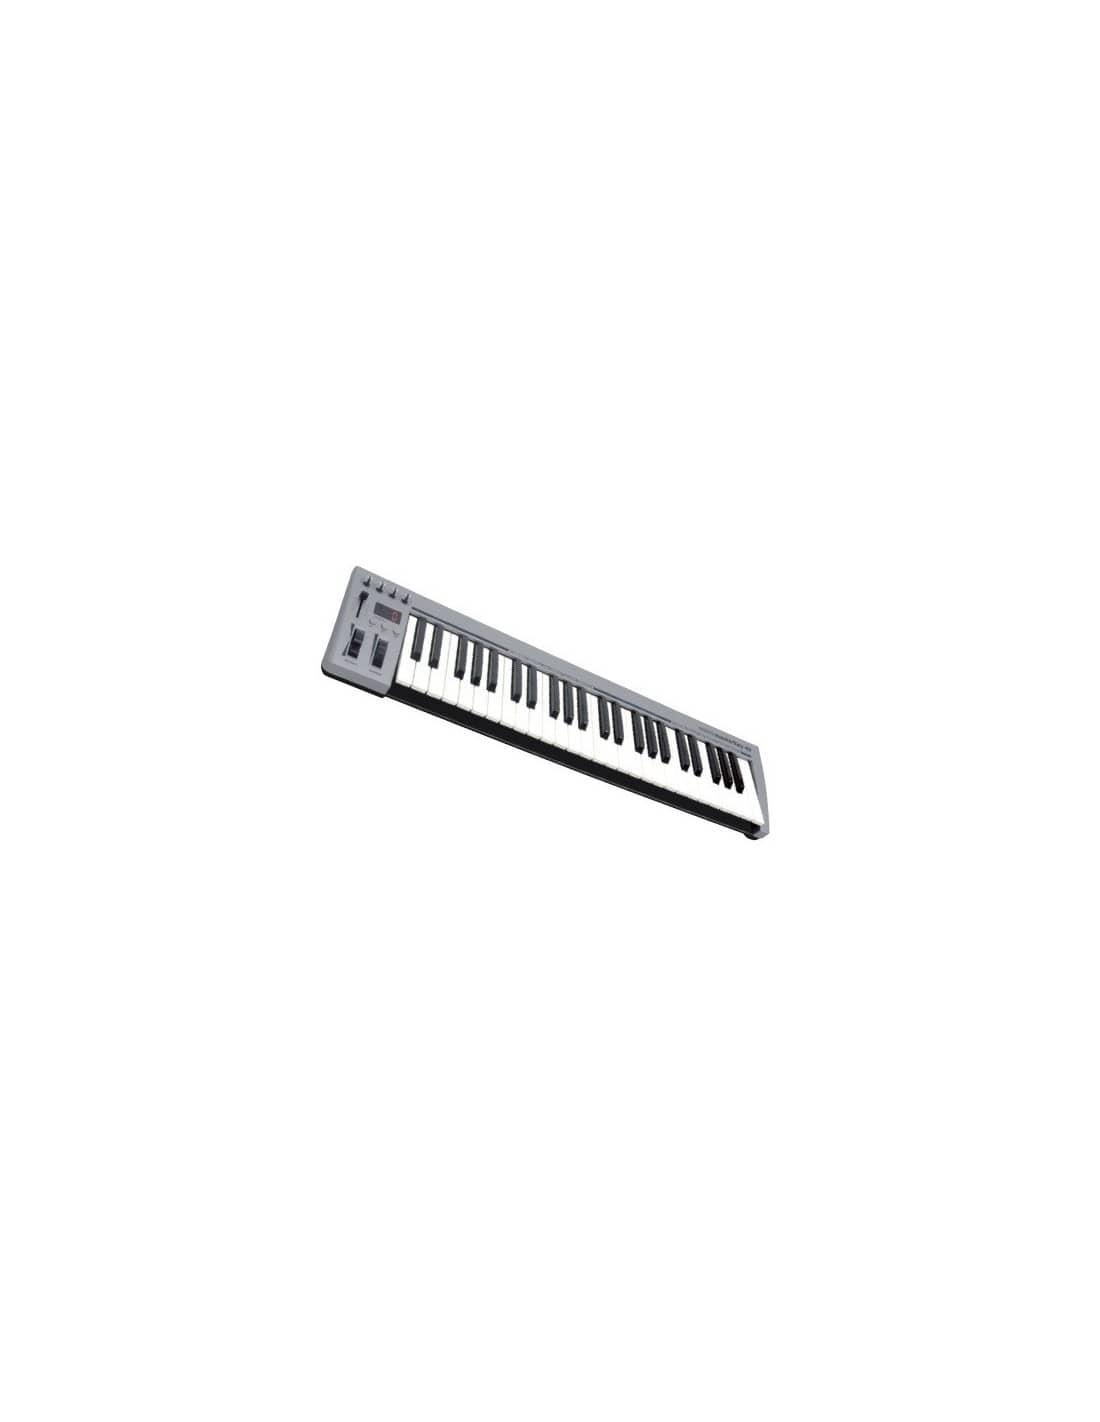 controlador masterkey 4 octavas mk-49